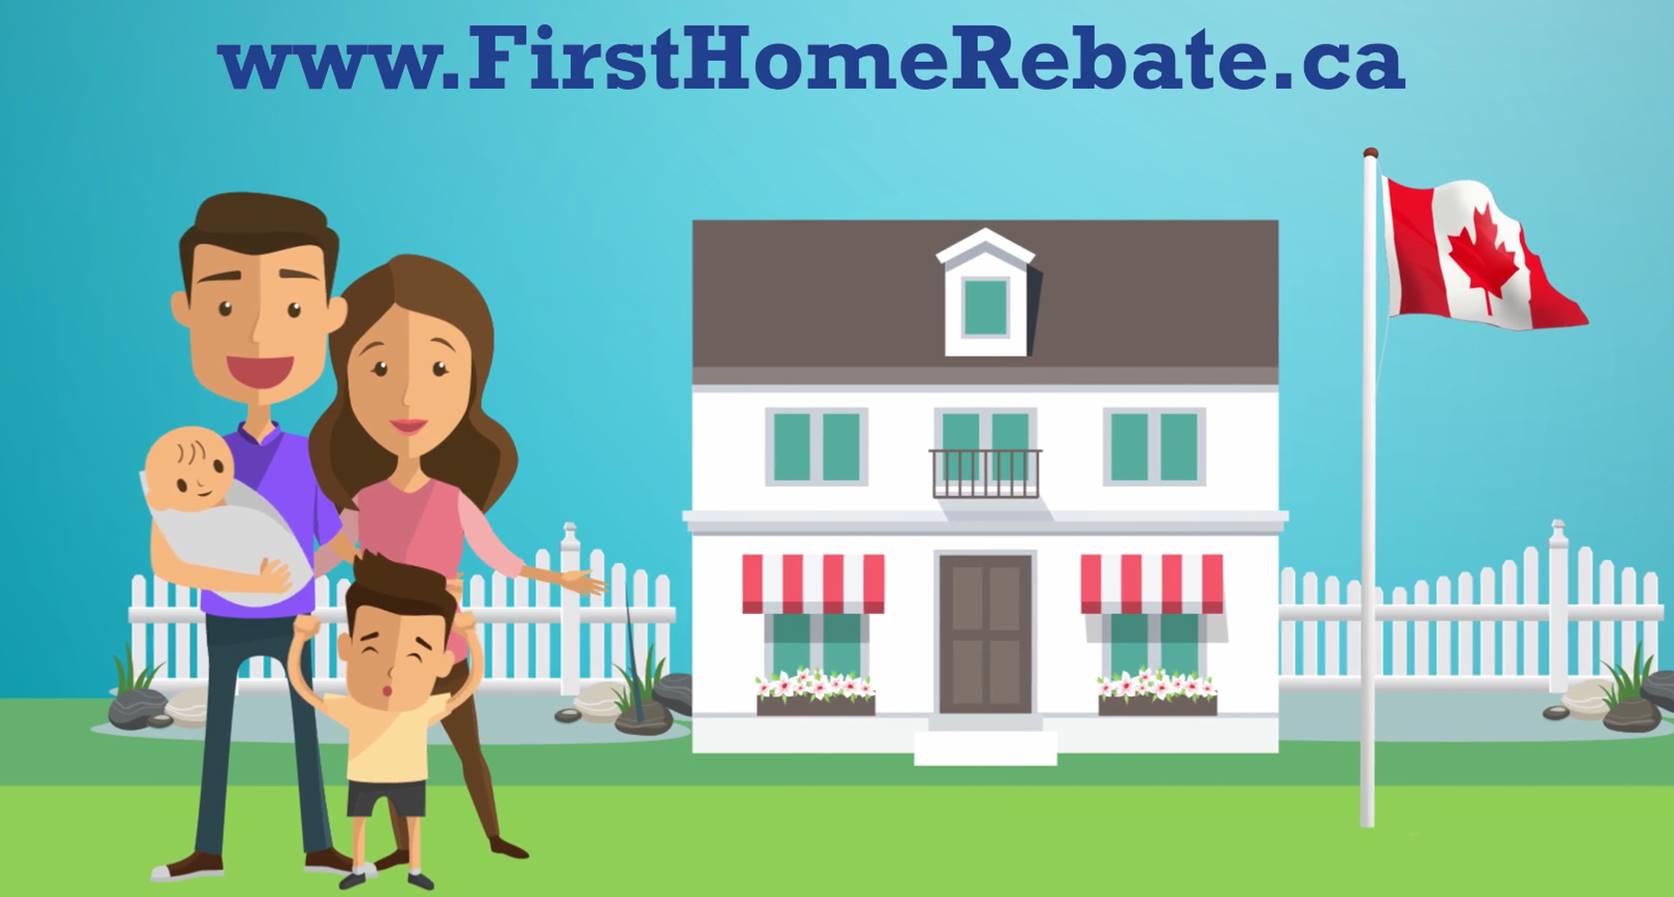 first-time-homebuyer-.jpg